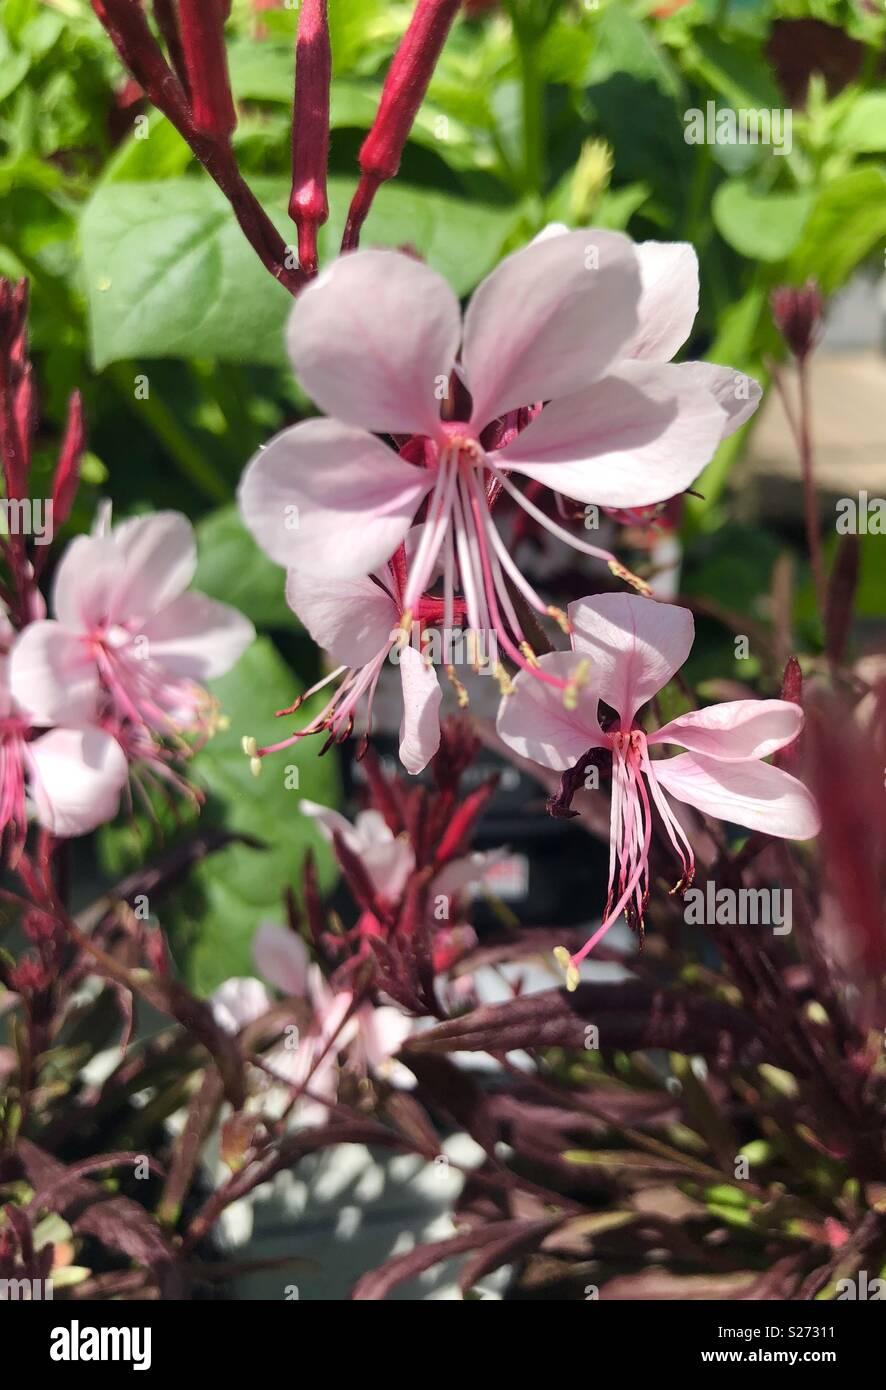 Gaura gaudi pink flowers Stock Photo